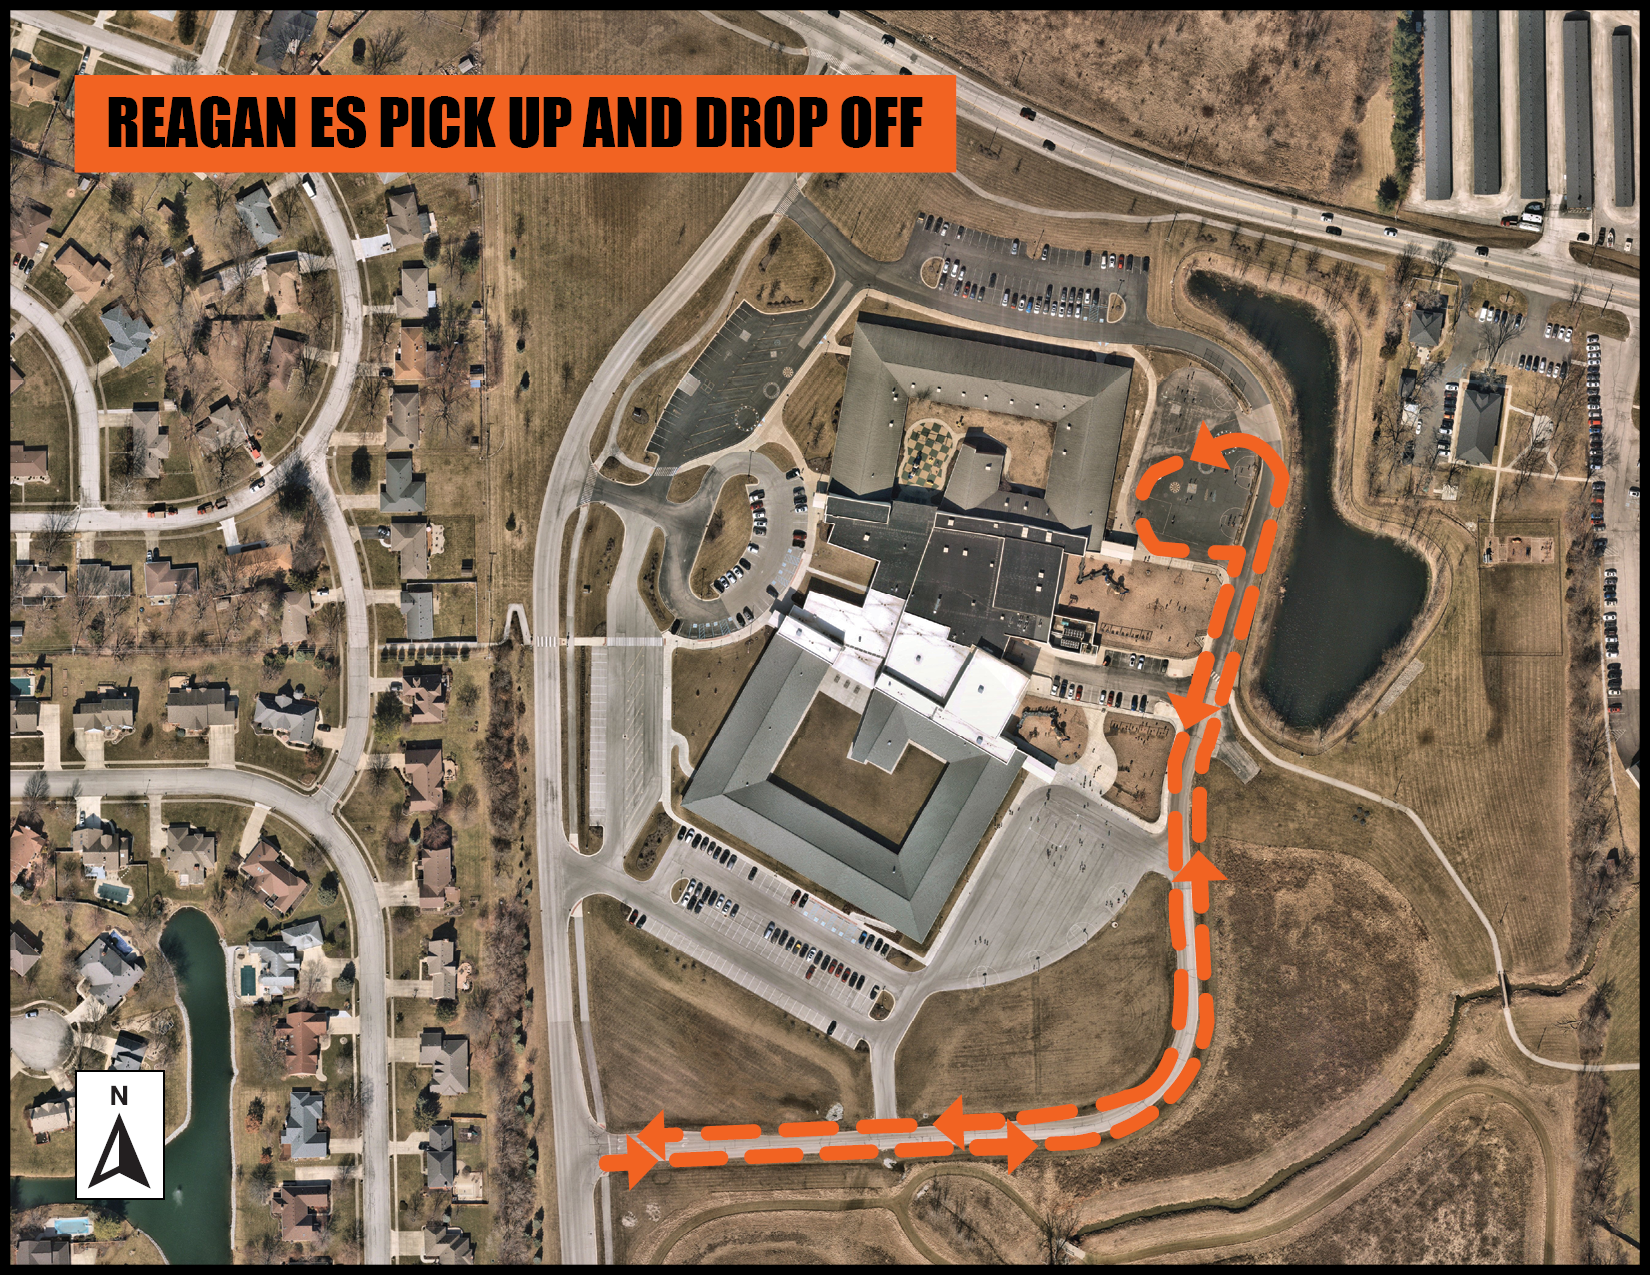 Reagan pickup drop off map